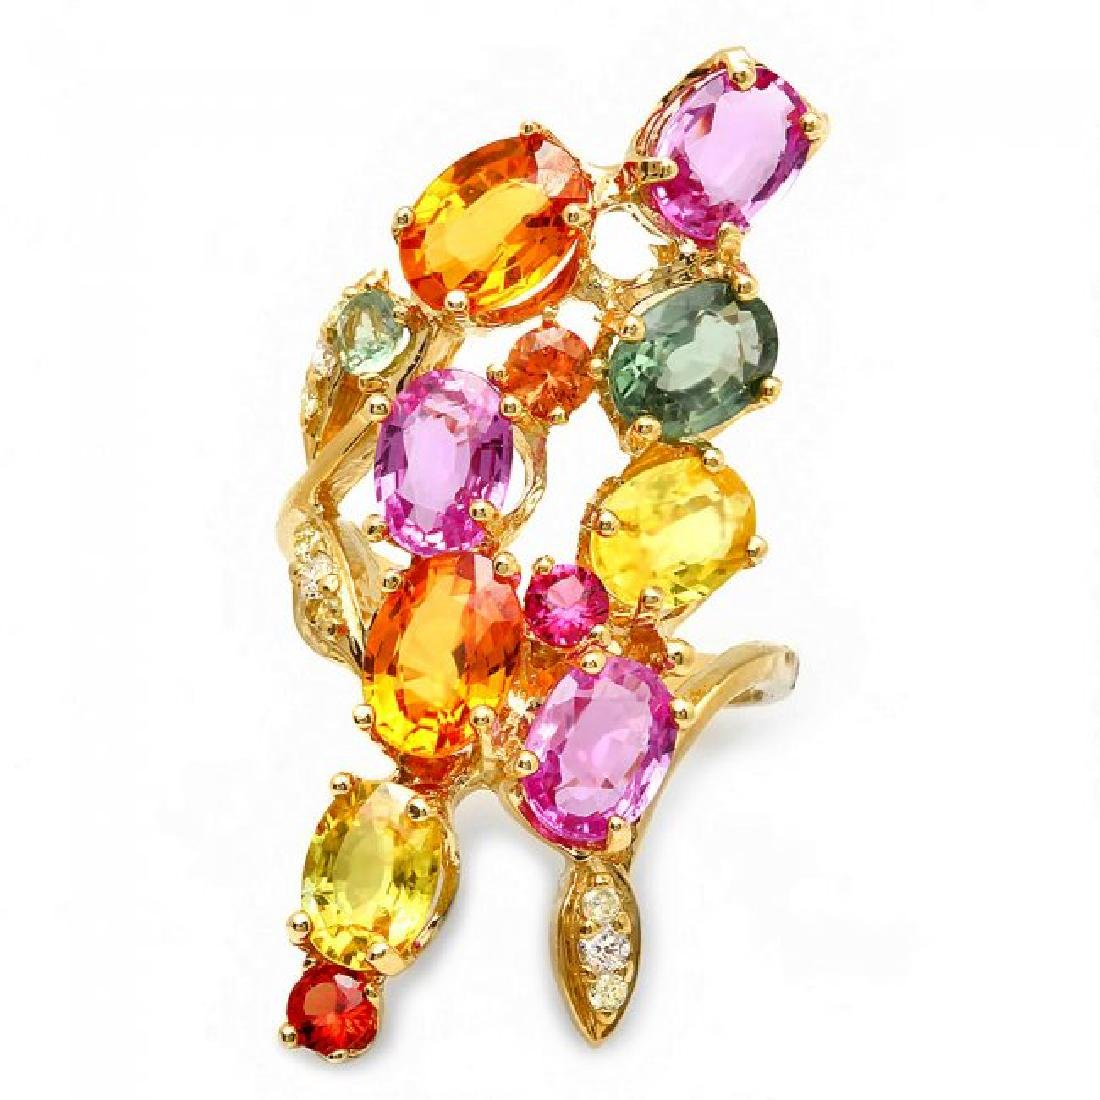 14k Gold 8.8ct Sapphire 0.20ct Diamond Ring - 3